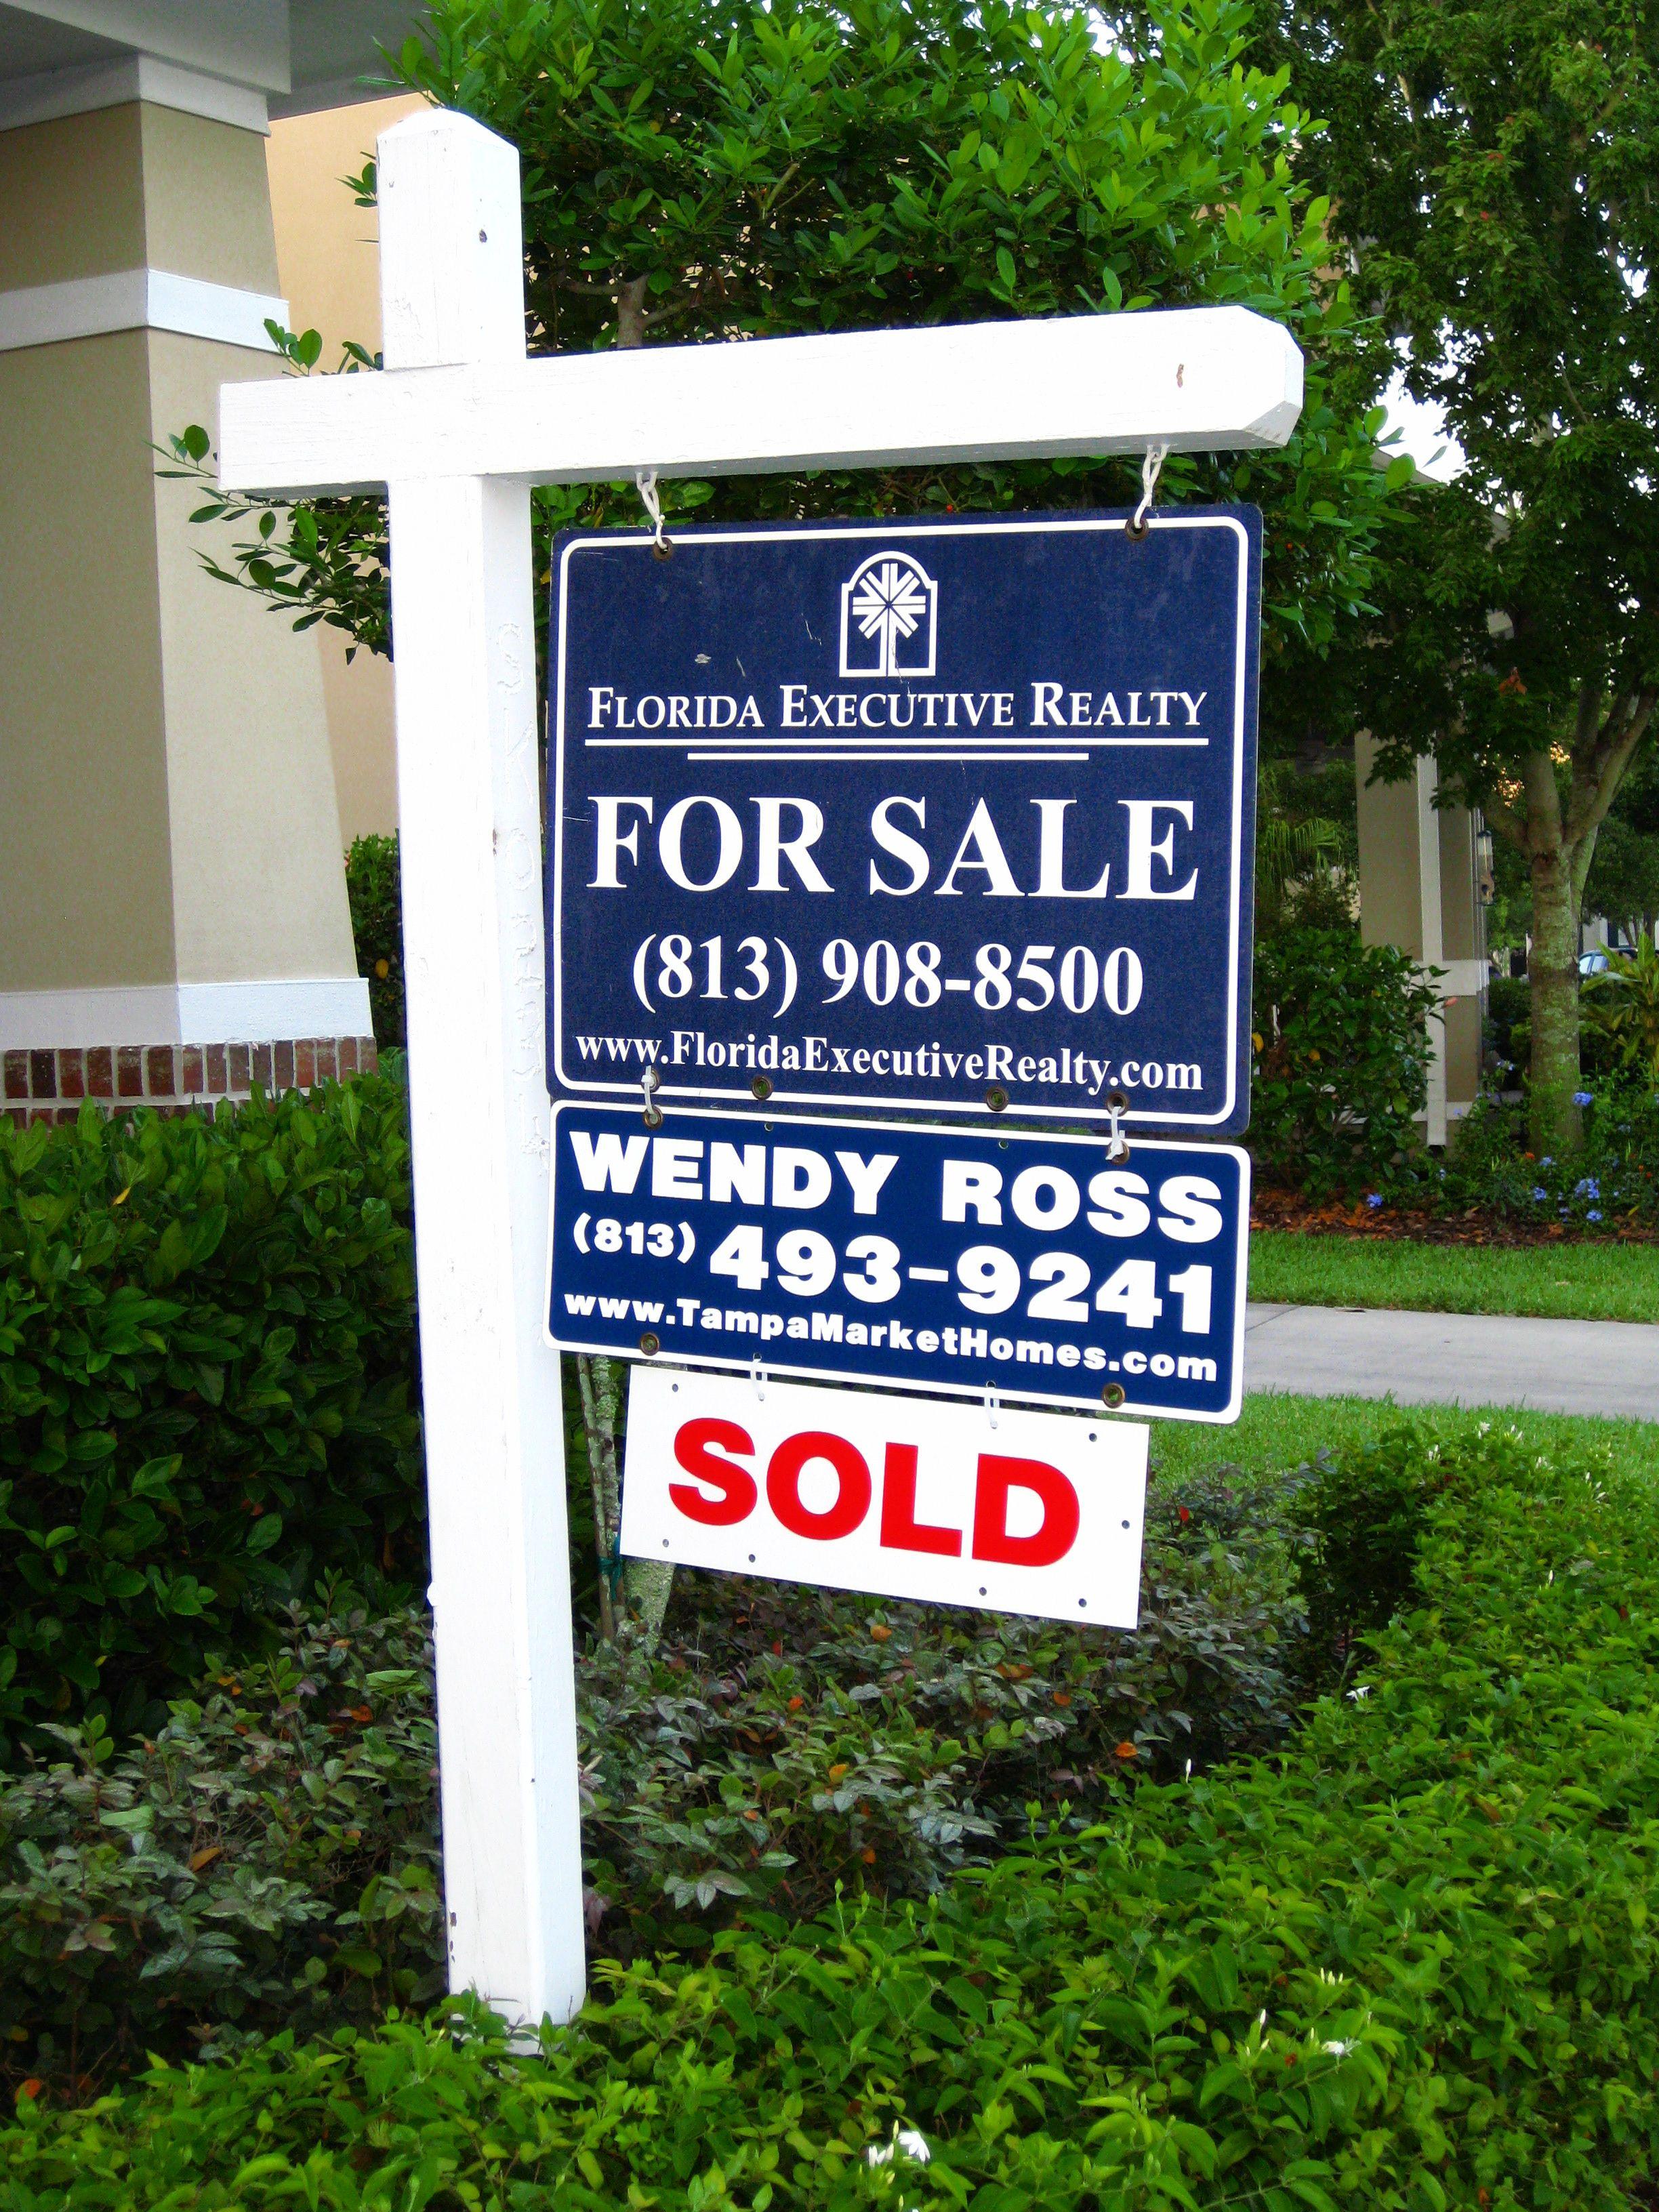 Real Estate TampaMarketHomes.com Tampa Bay Real Estate Wendy Ross (813) 493-9241 WendyRoss@TampaMarketHomes.com